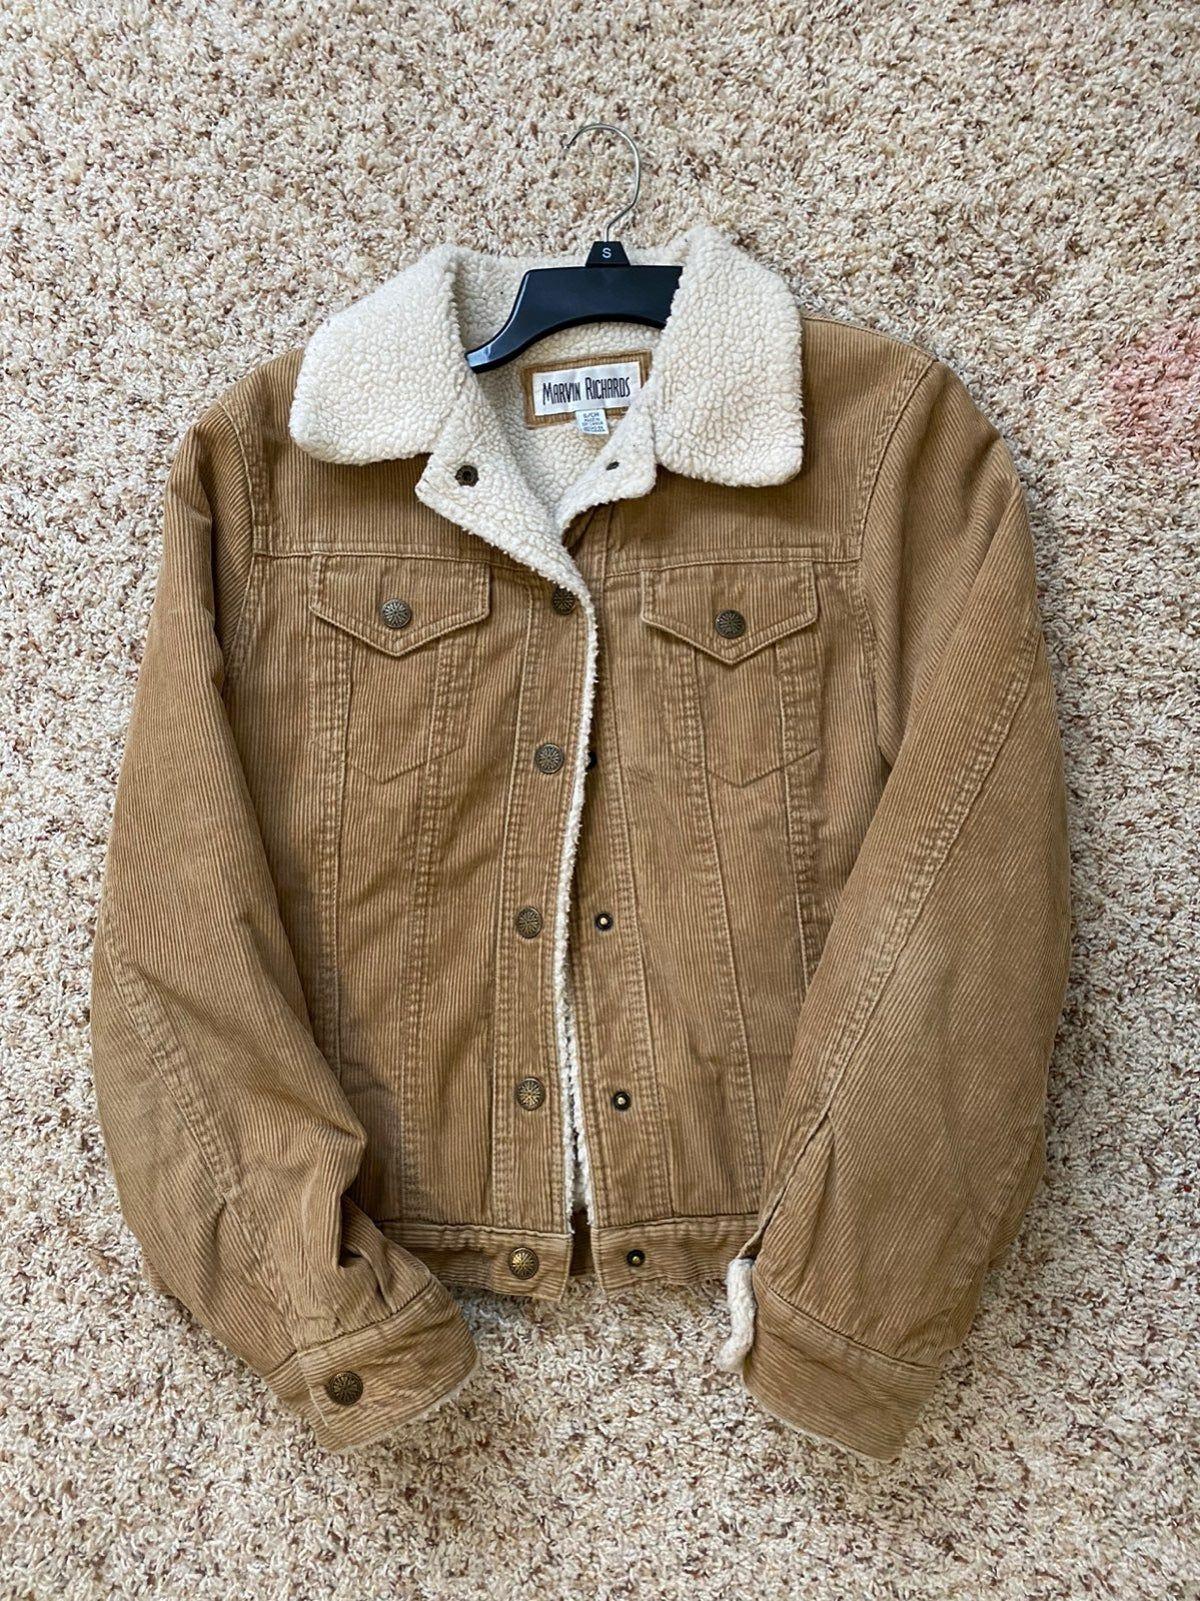 Marvin Richards Beige Jean Jacket In 2021 Thrift Fashion Beige Jeans Jackets [ 1601 x 1200 Pixel ]